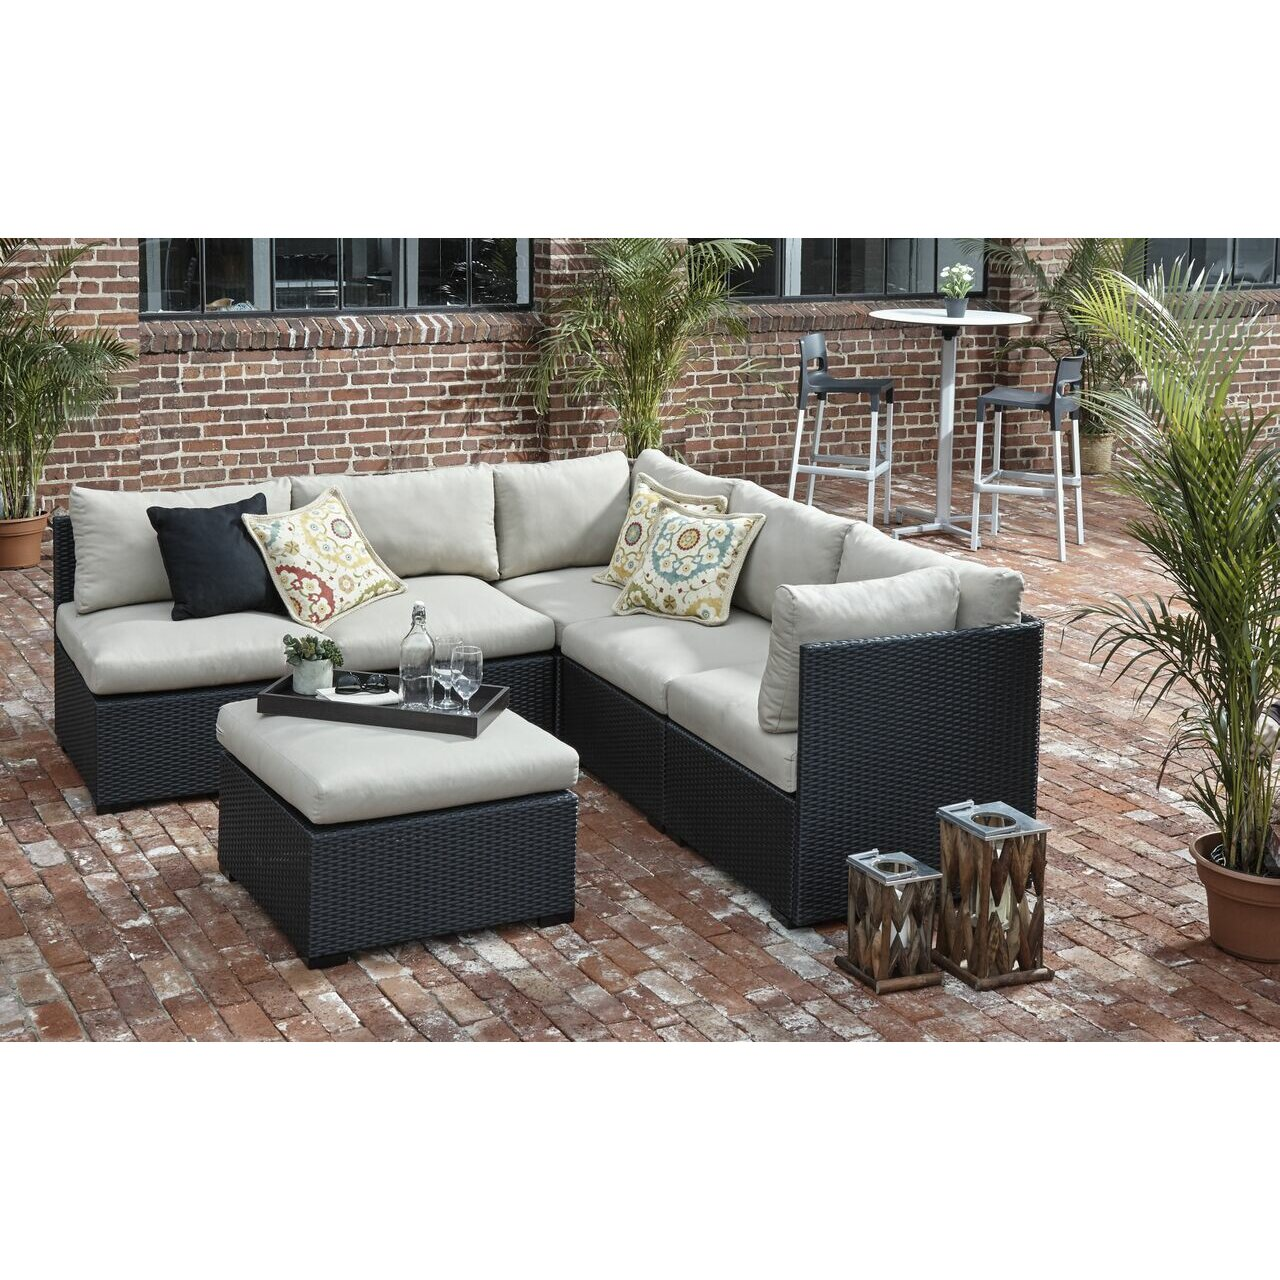 Brayden Studio Vanbuskirk Ottoman With Cushions Reviews